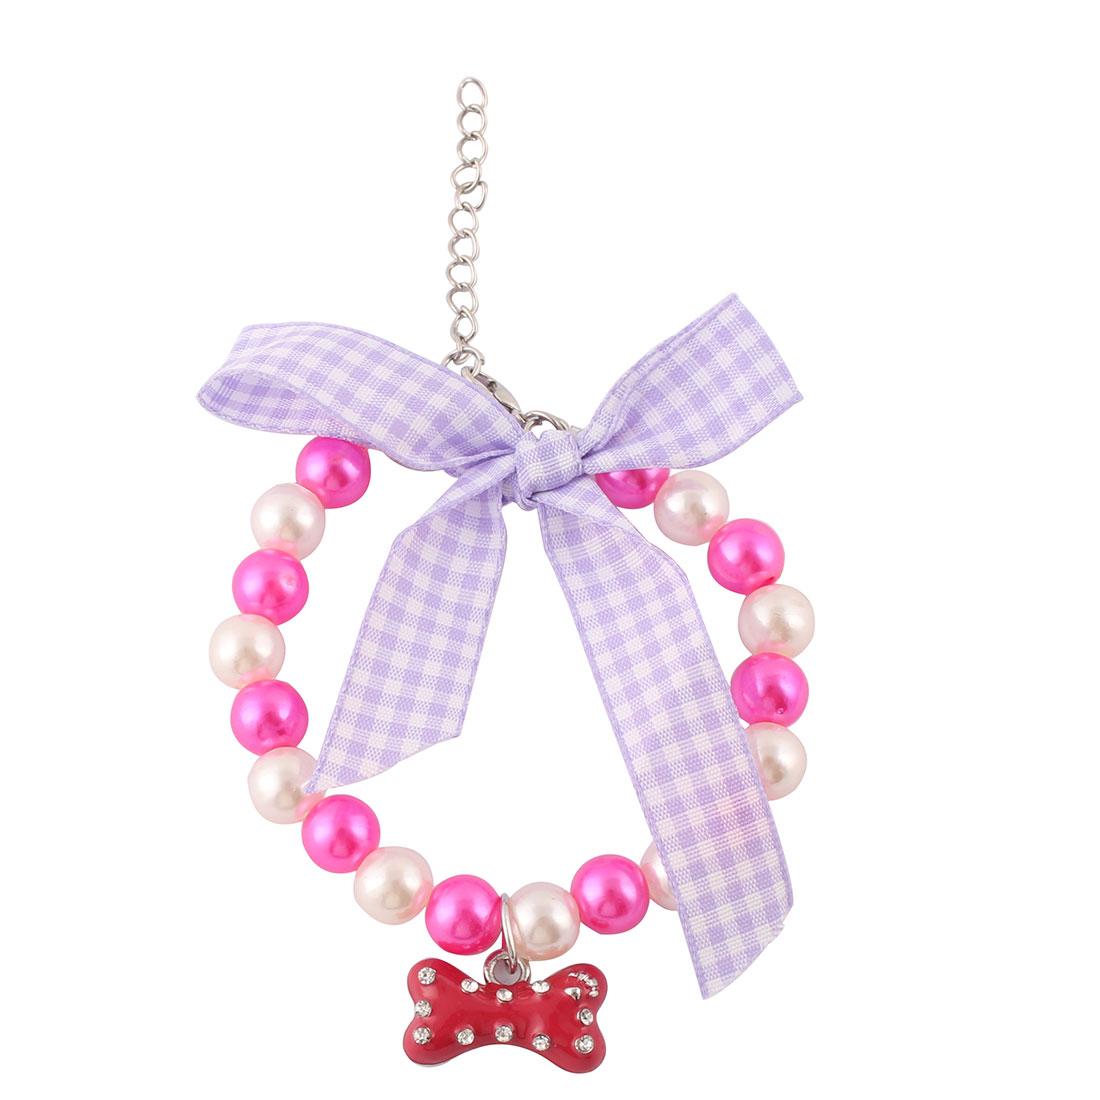 Festival Plastic Bead Bowknot Decor Pet Ornament Pet Necklace Fuchsia 20cm~25cm Girth